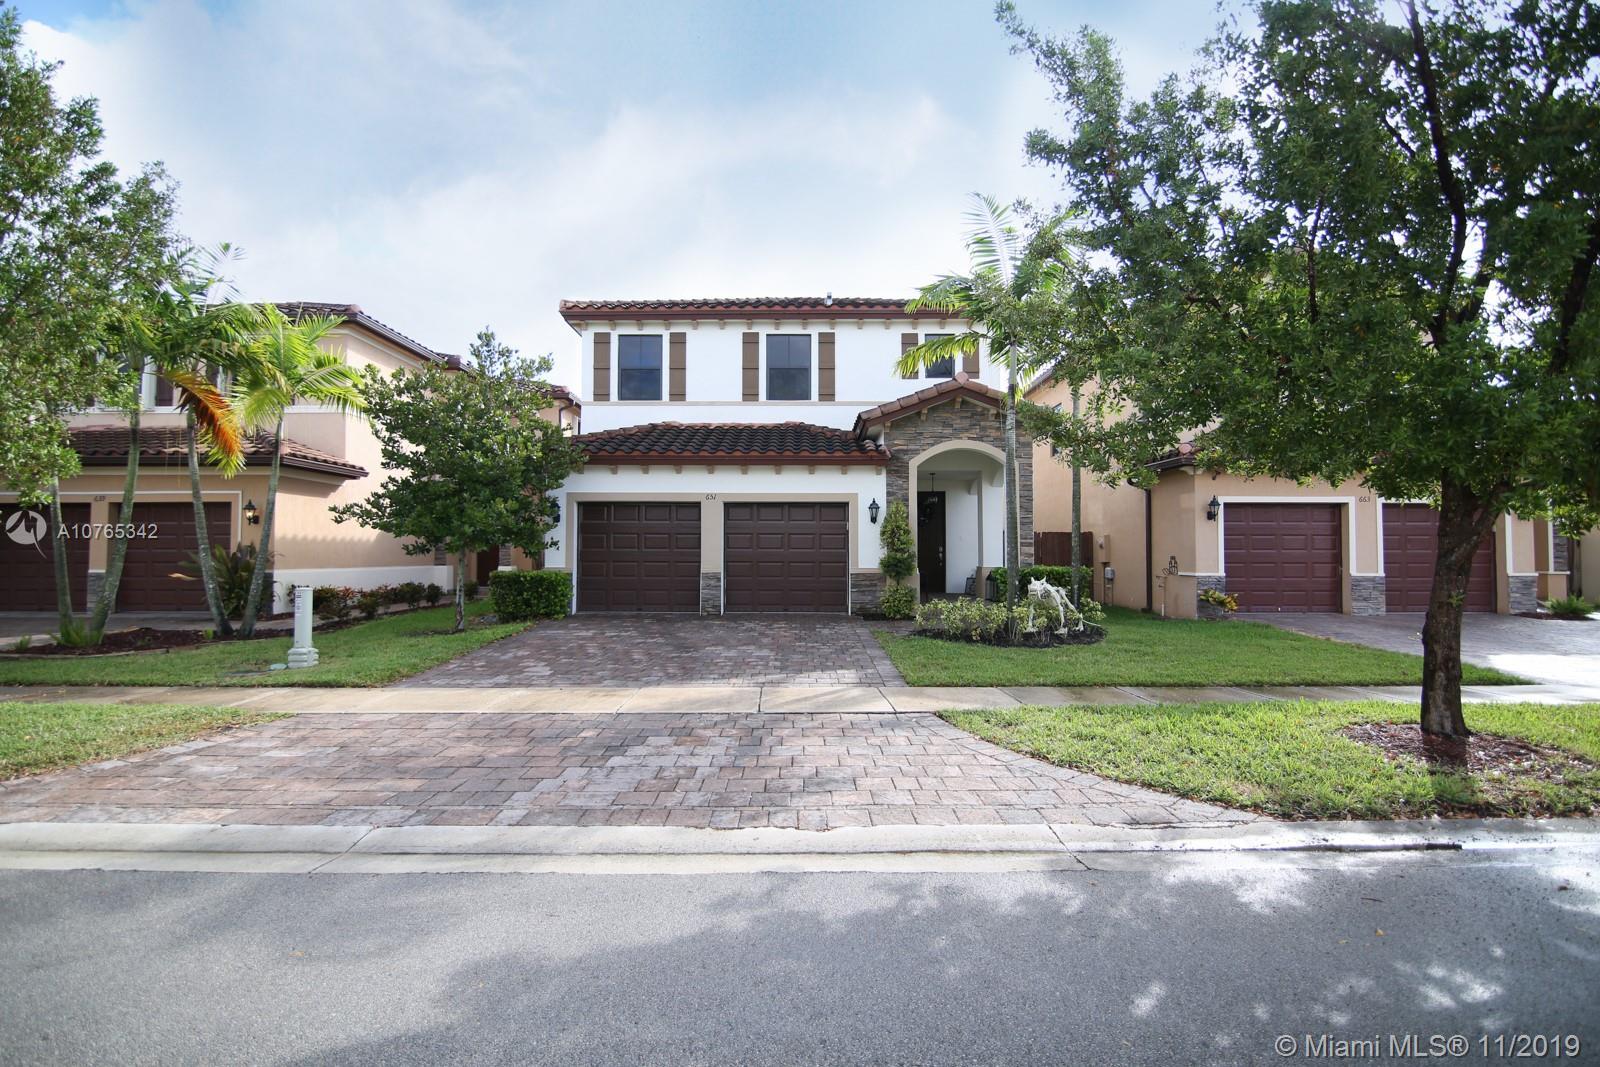 651 34th Ave, Homestead, FL 33033 - Homestead, FL real estate listing